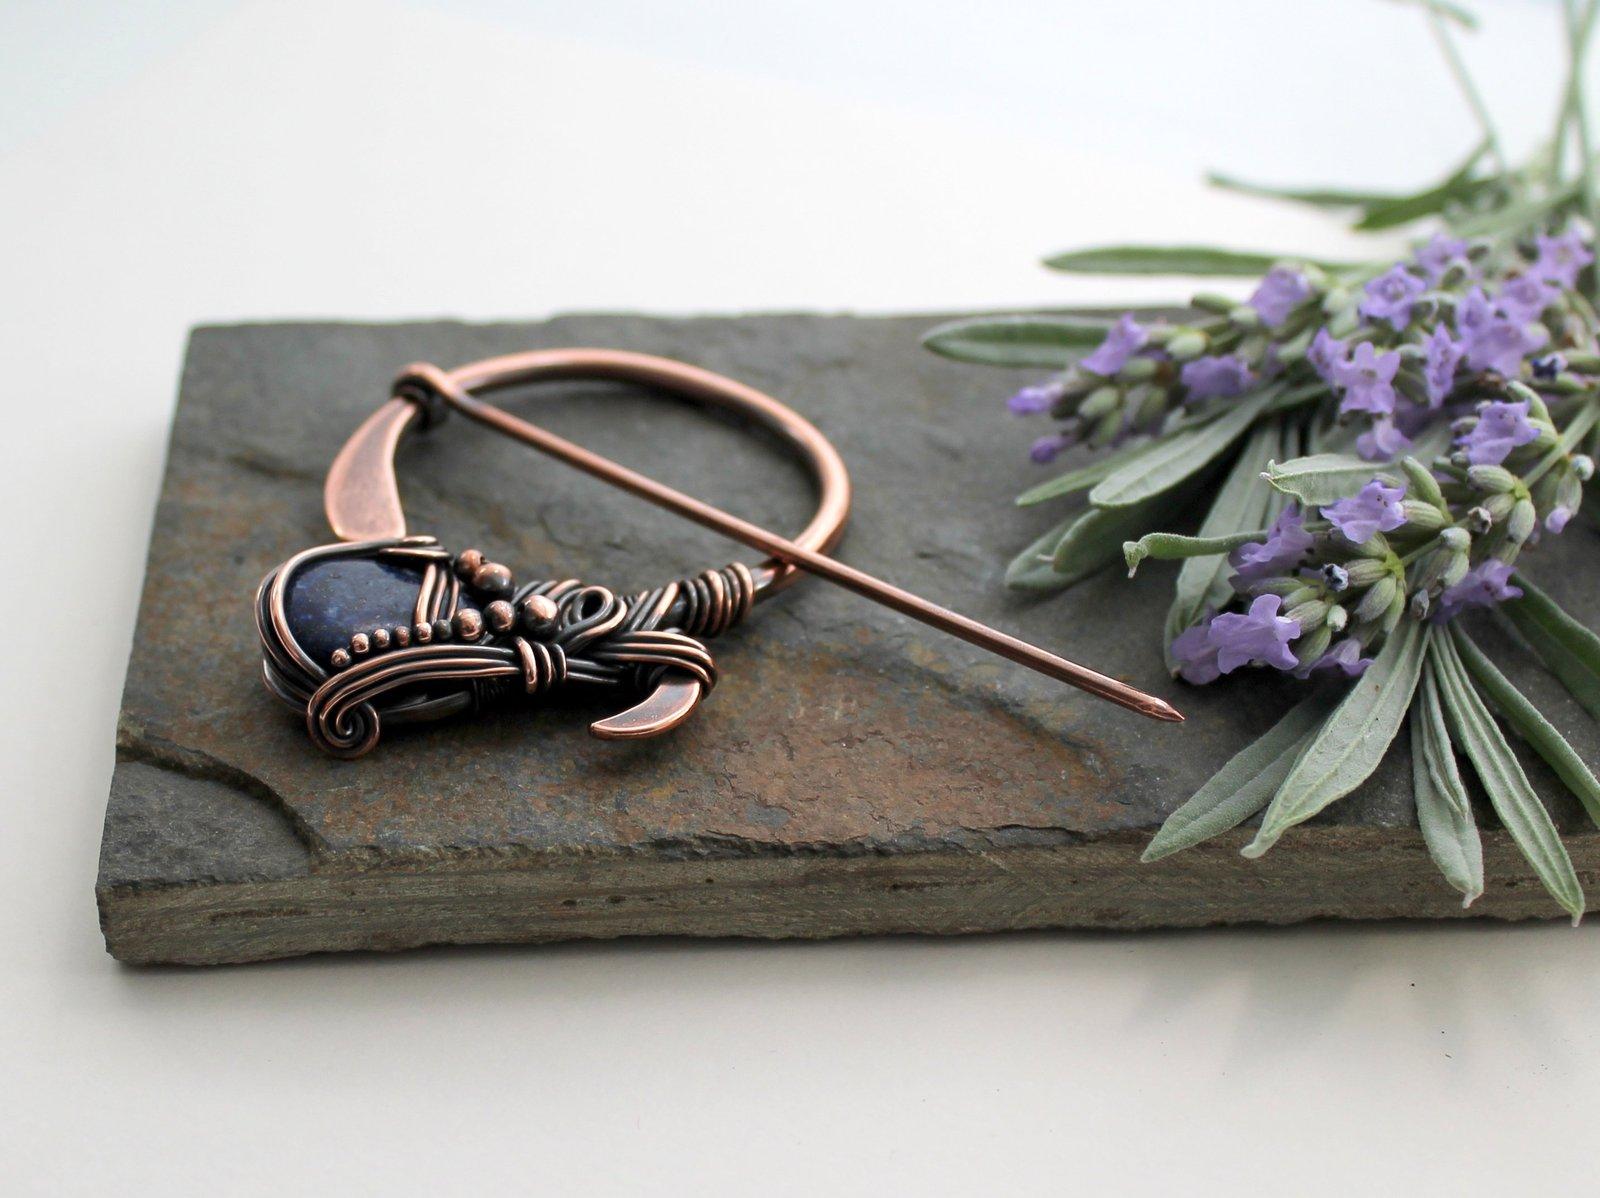 Penannular Brooch - Copper and Lapis Lazuli - Celtic fibula